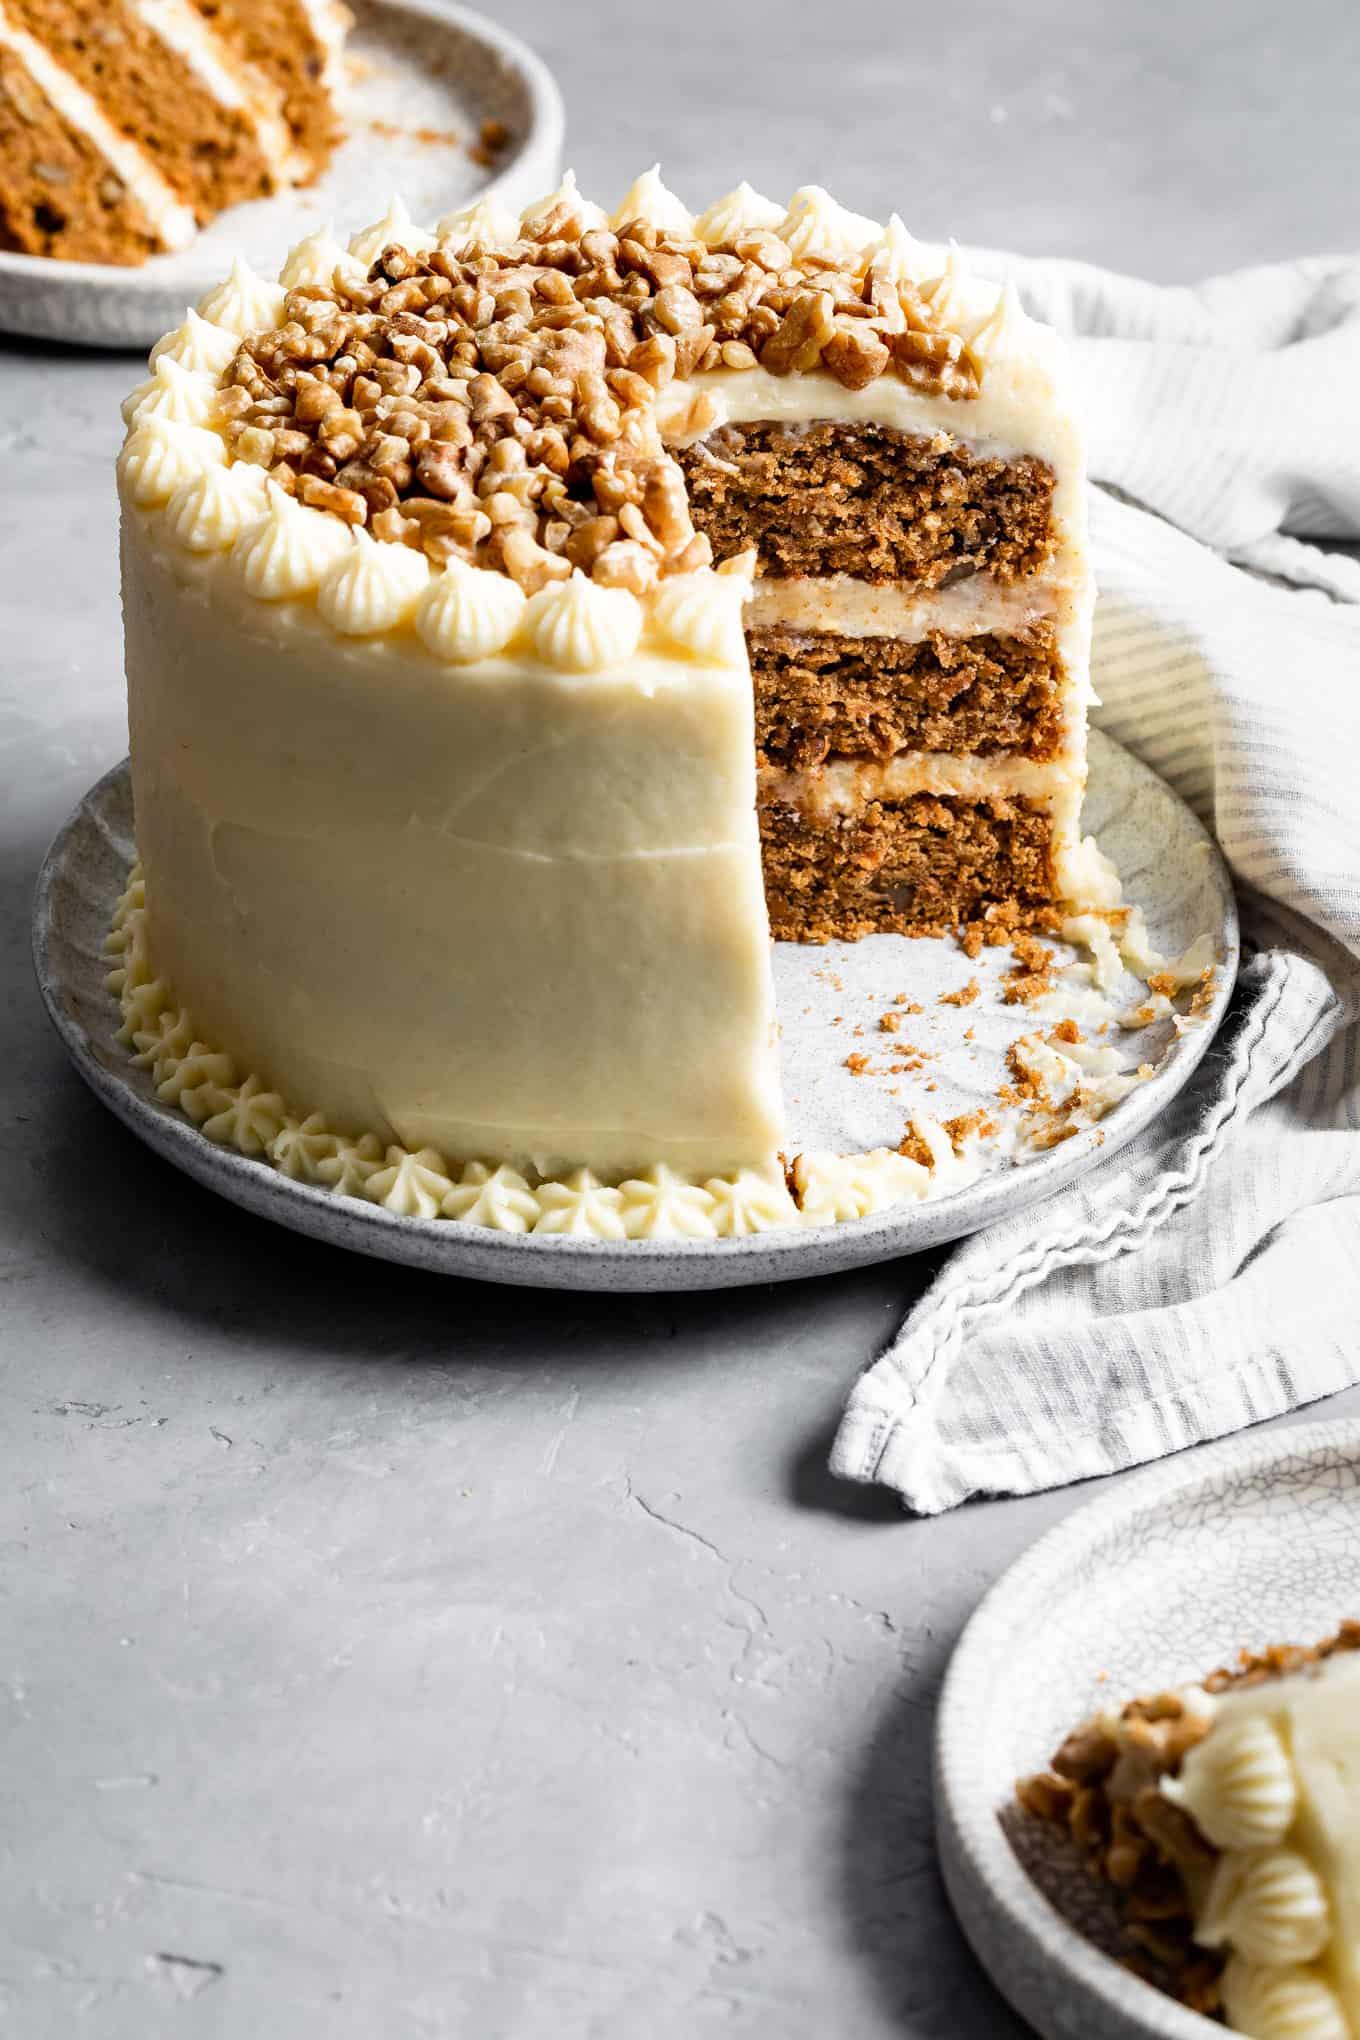 Best Gluten-Free Carrot Cake